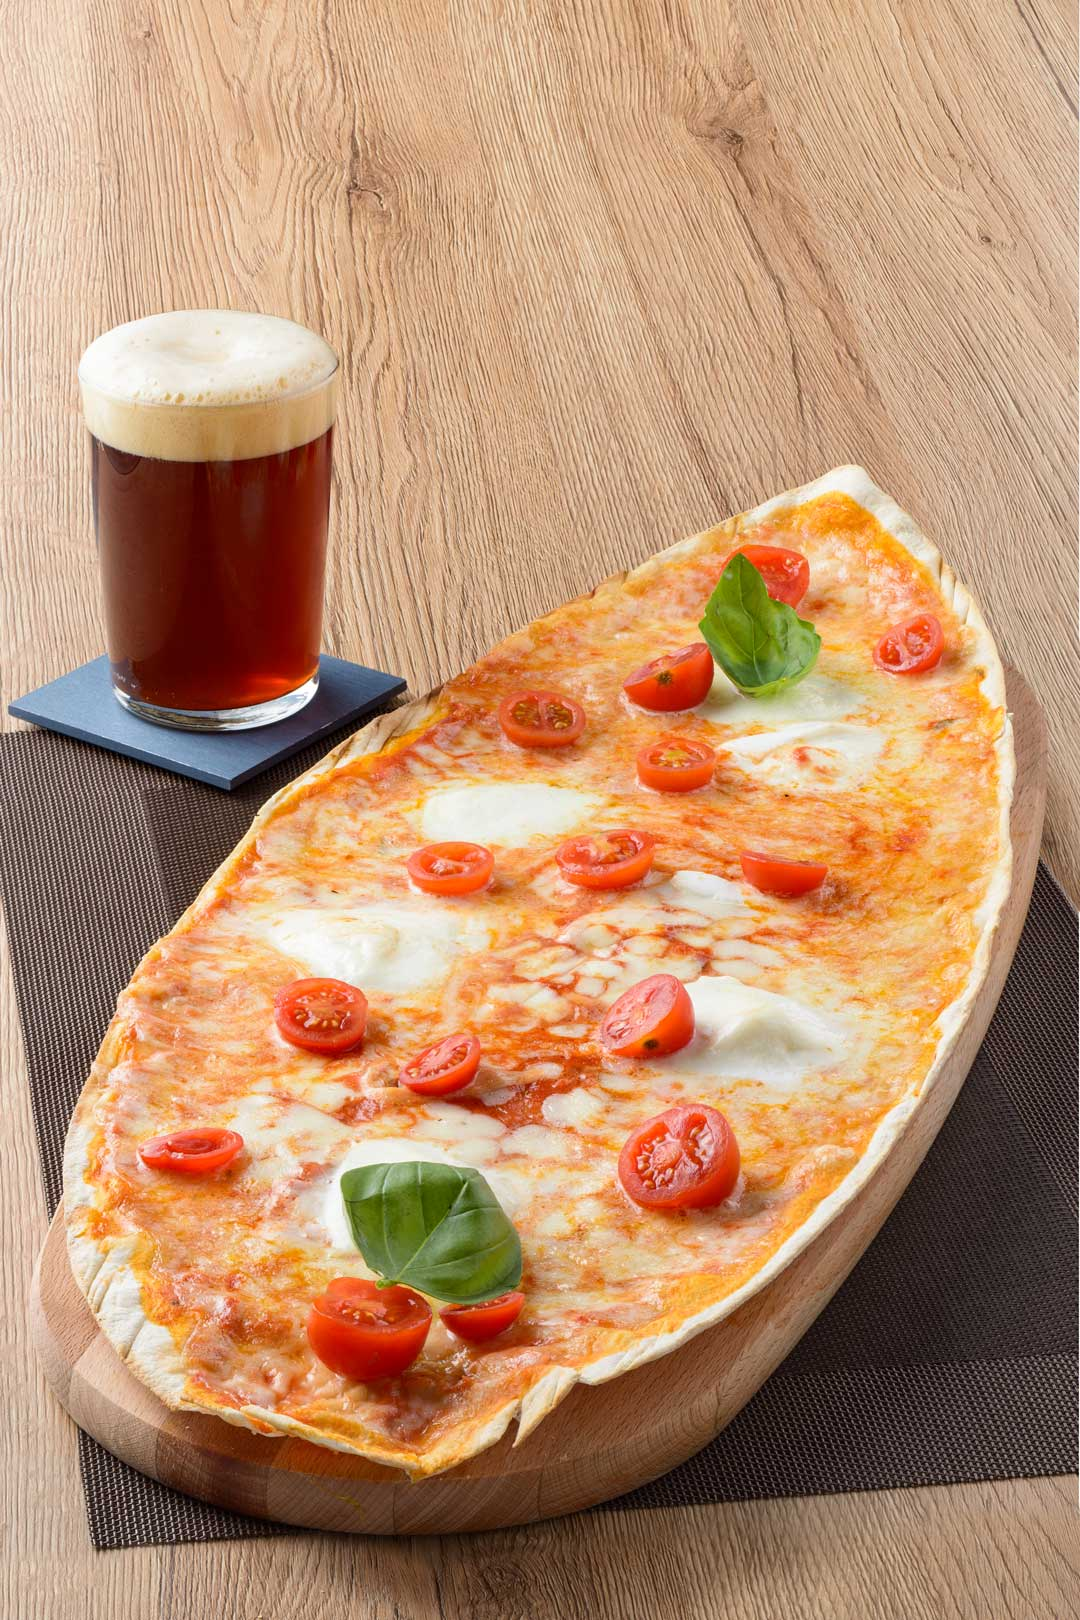 Amami - Pizza senza lievito